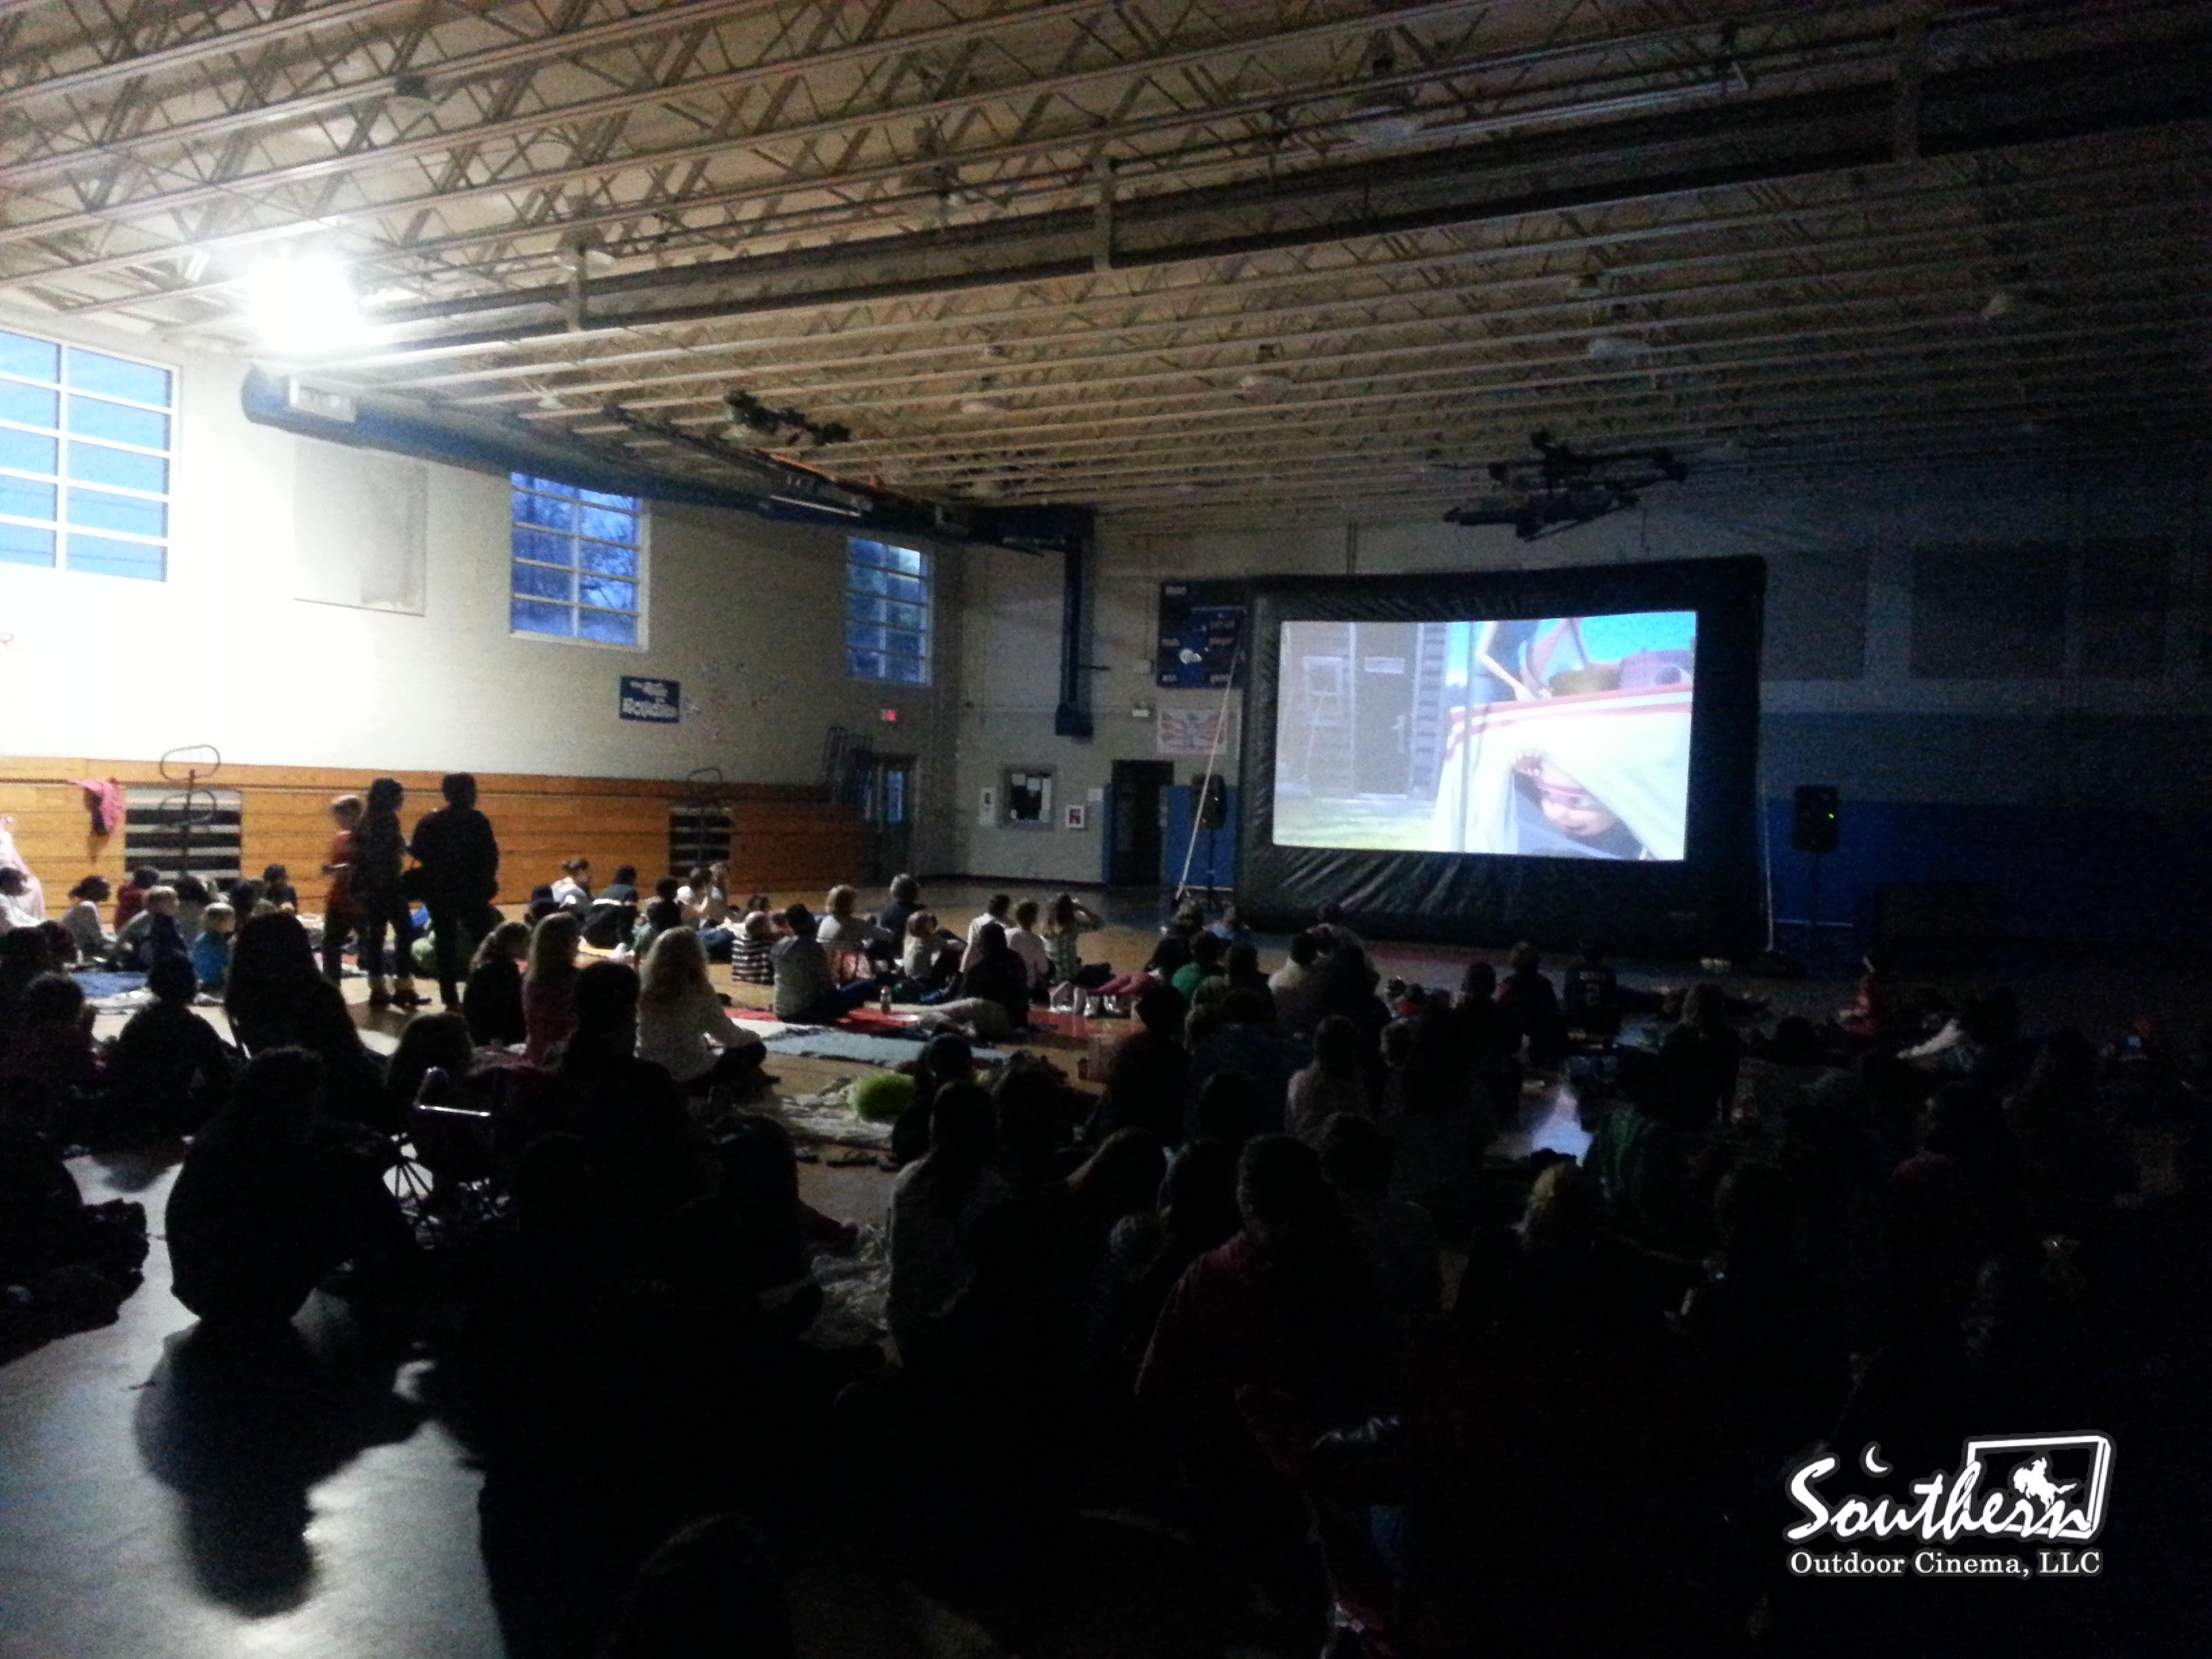 southern outdoor cinema indoor movie